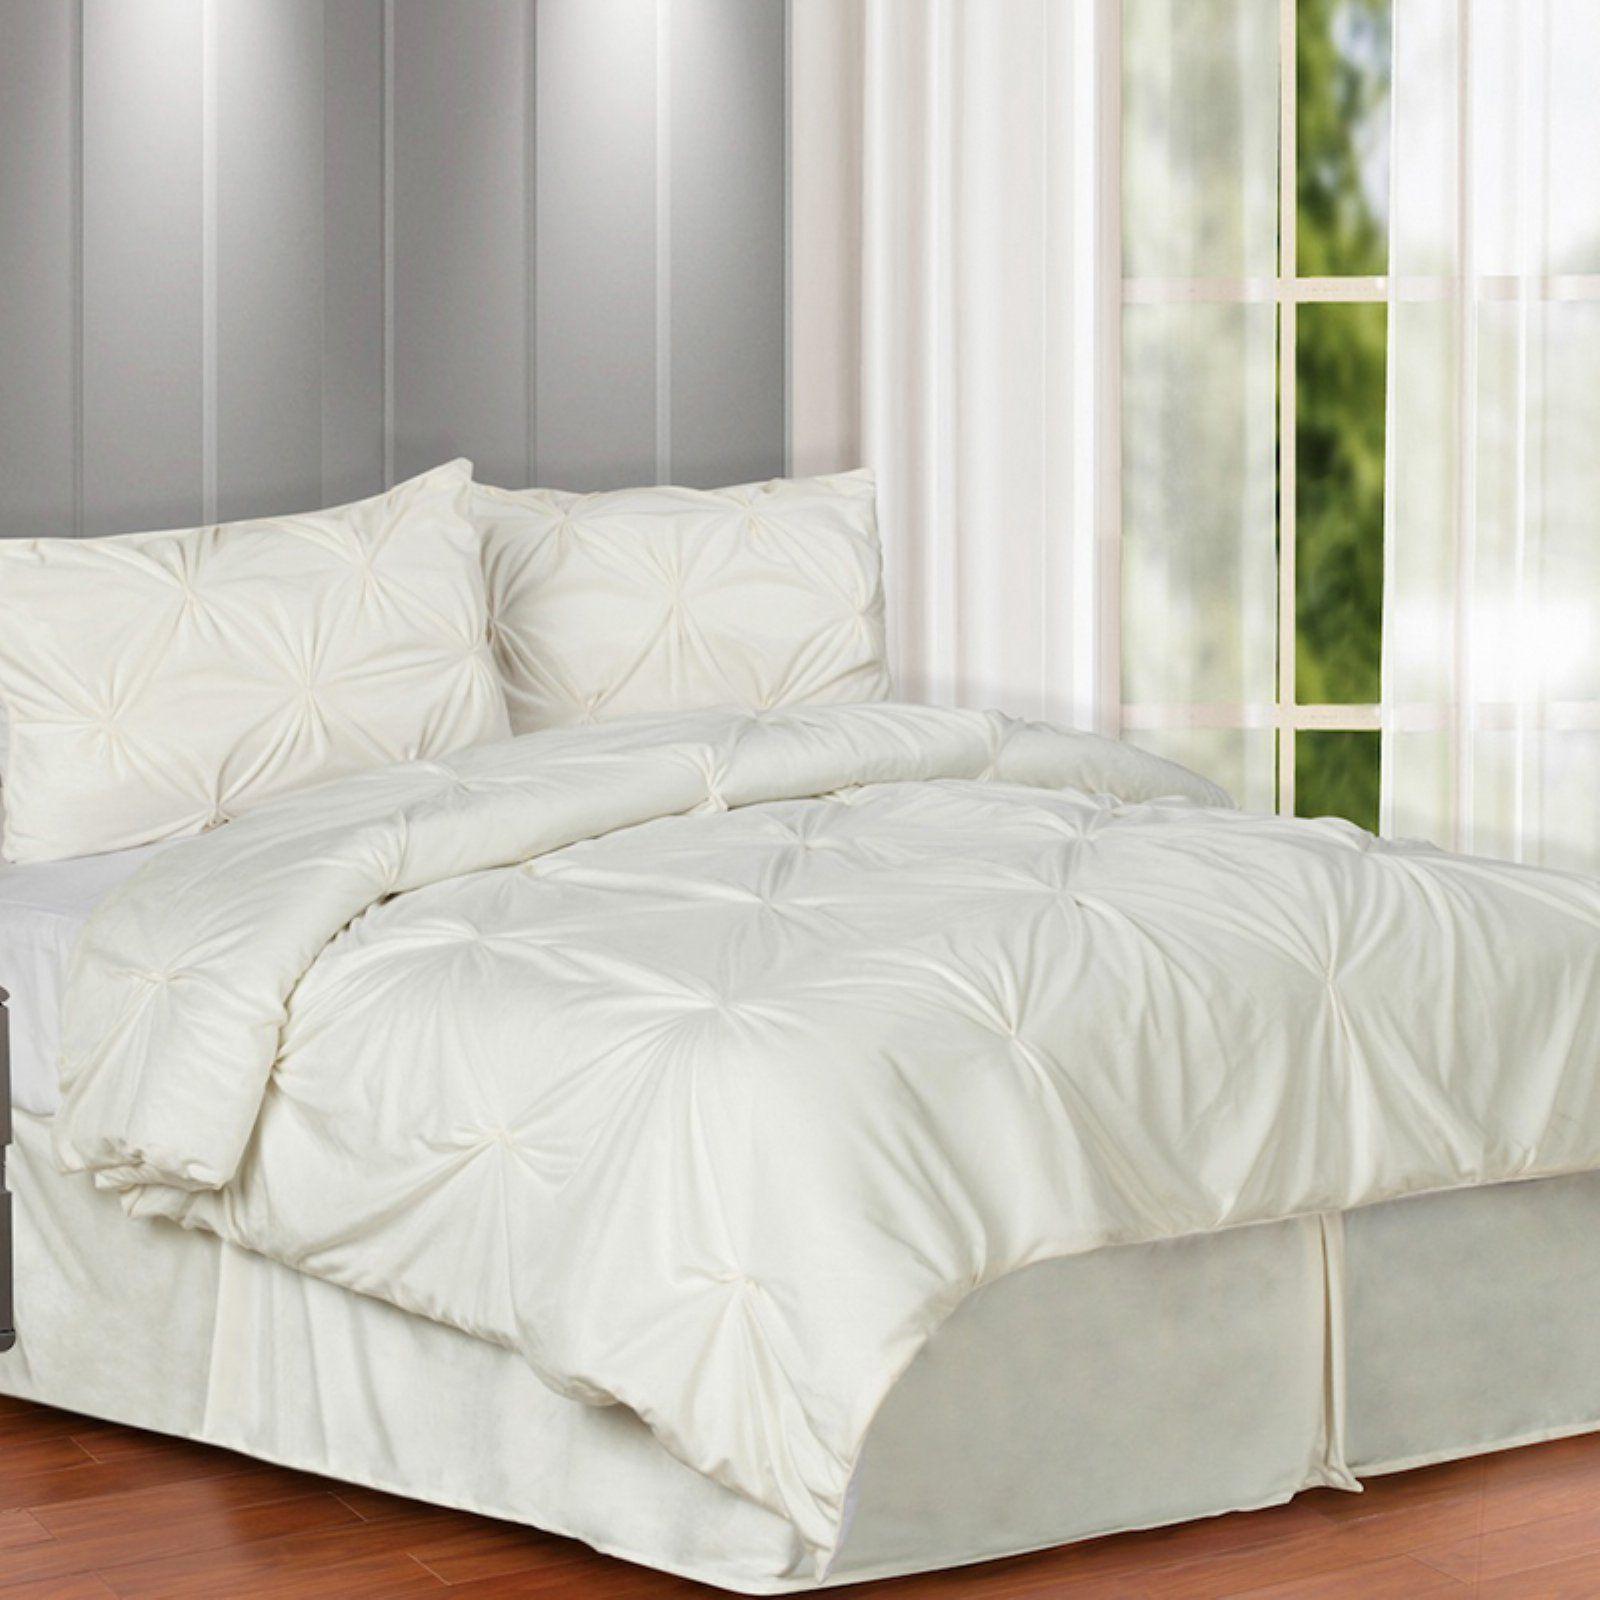 Hudson Street Pintuck Plush 3 Piece Complete Comforter Set Silver, Size: King